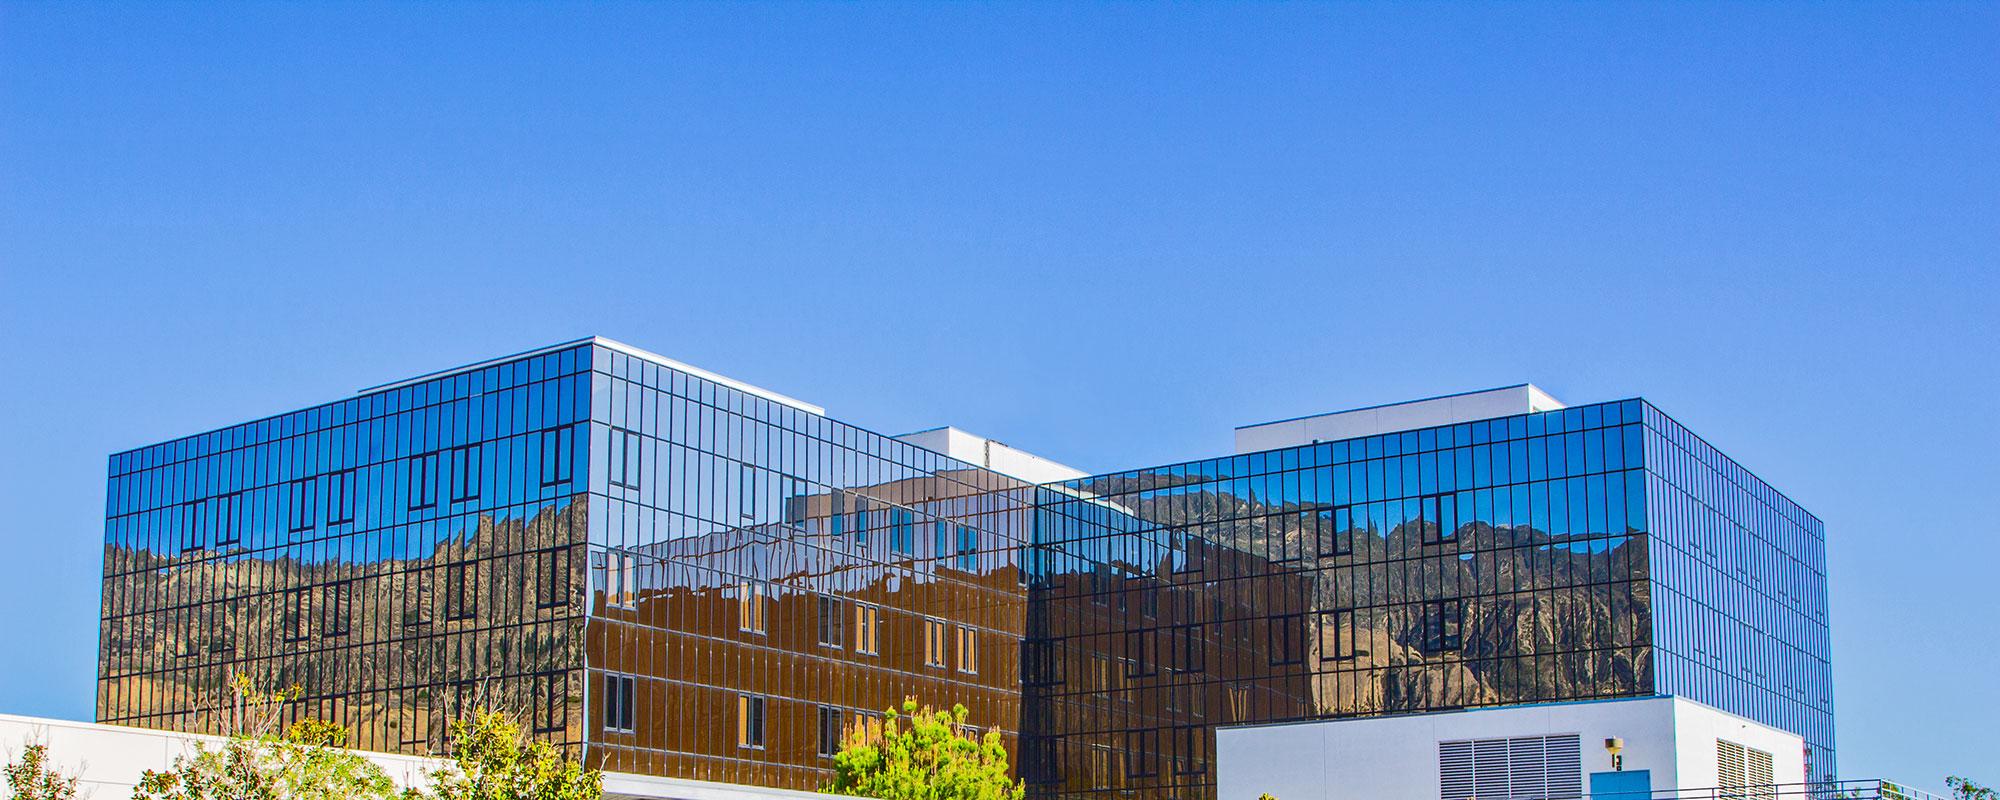 UCLA-Olive View Internal Medicine Residency